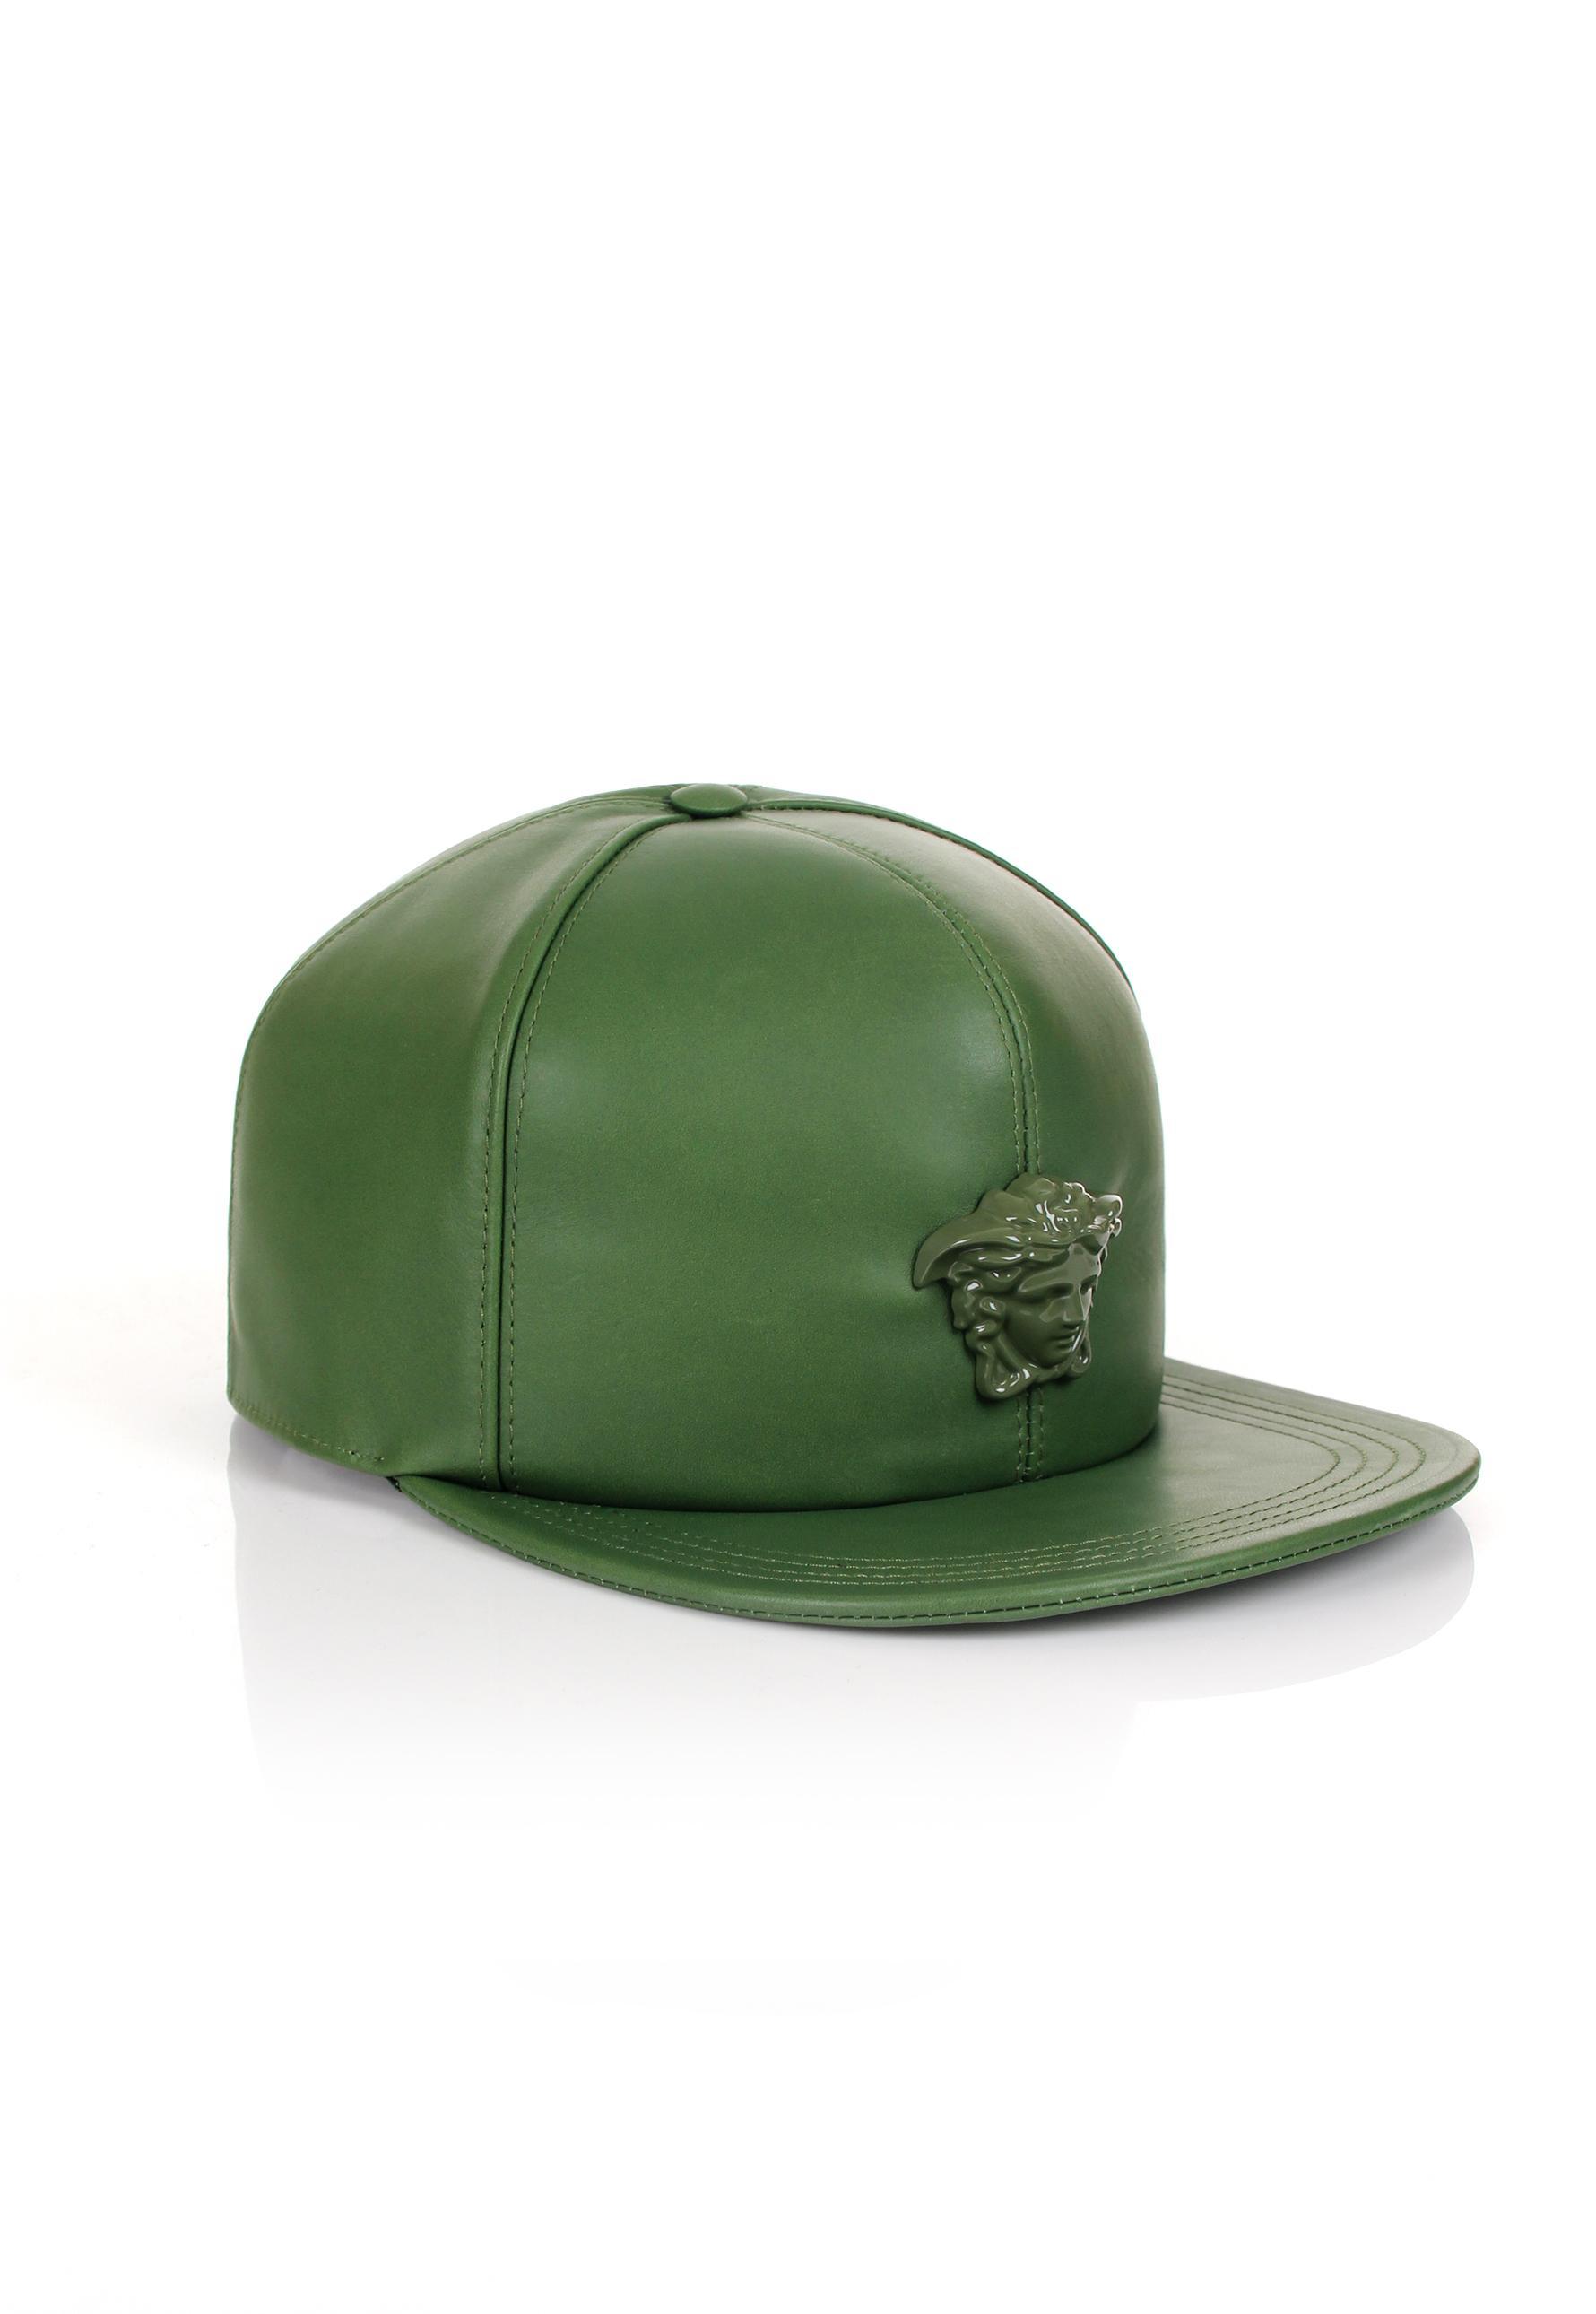 f32d9f7a35c ... hot versace medusa logo leather show cap khaki khaki in green for men  lyst 035f8 f4616